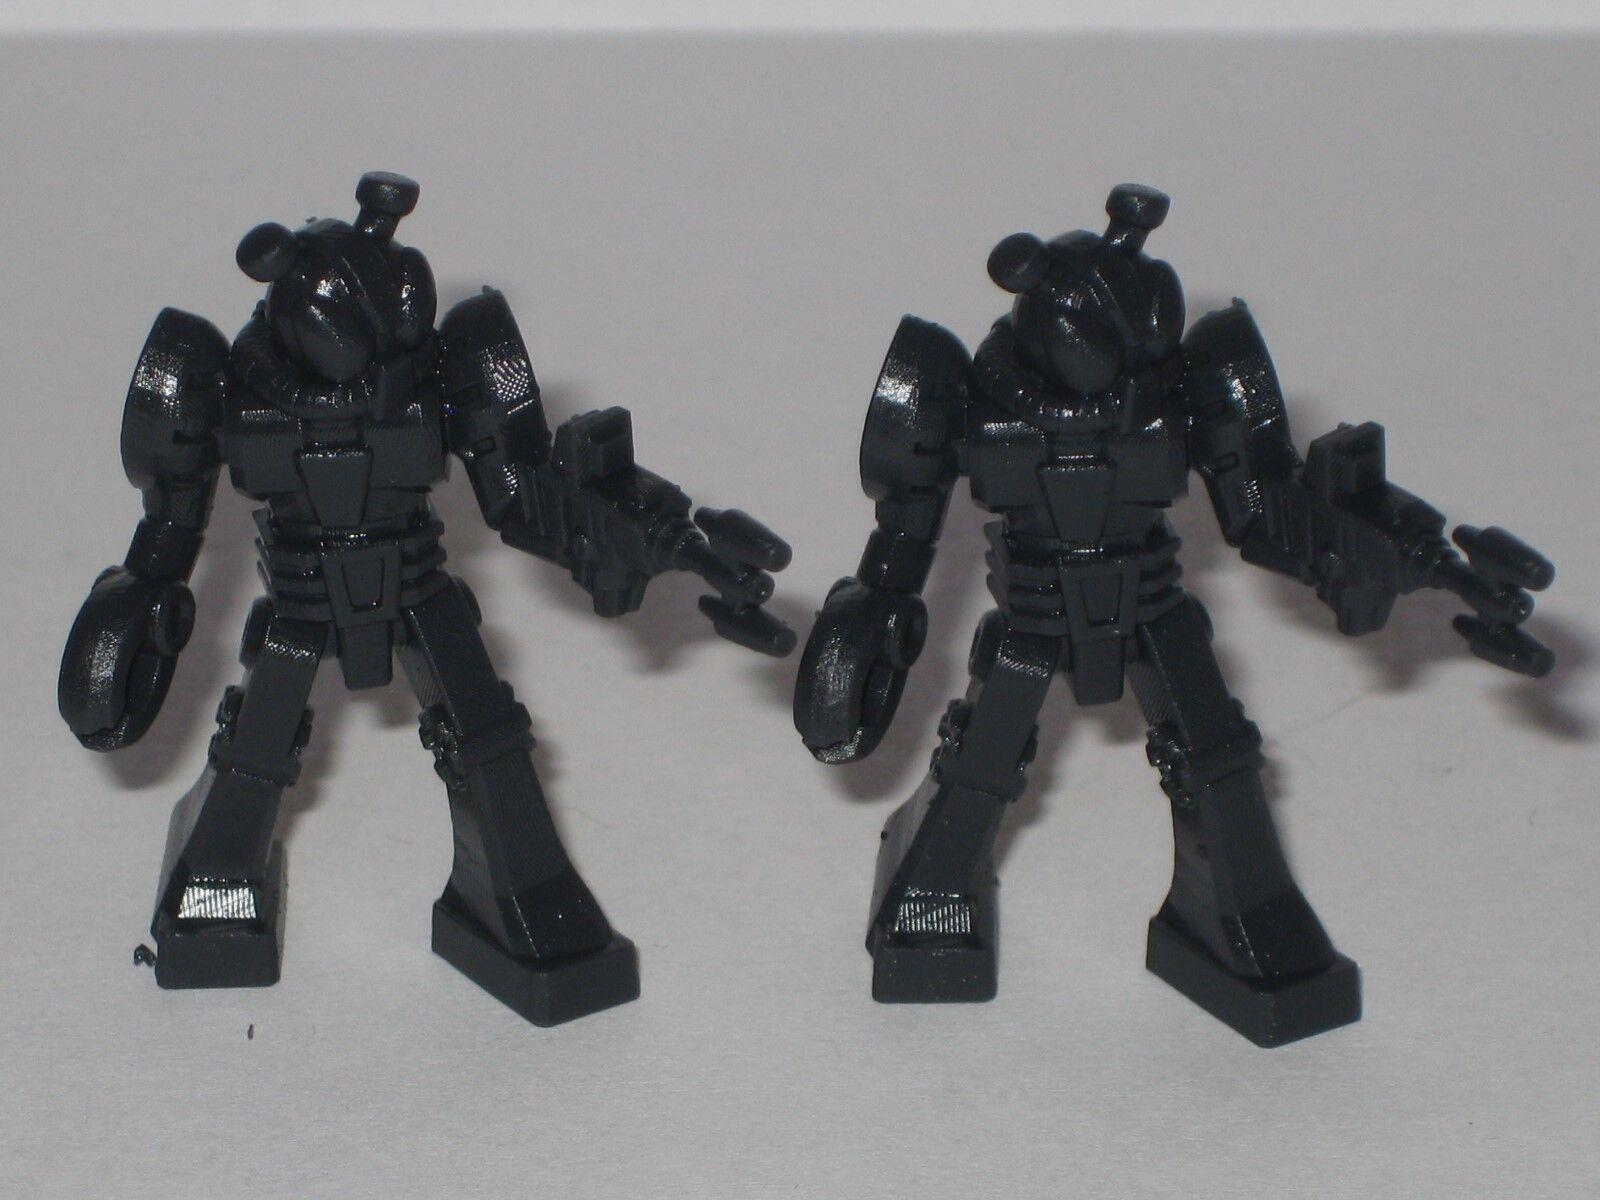 Diaclone Reboot Dia-Battles WARUDER KABUTRON Army Army Army 3d Printed Insecticons b06f60